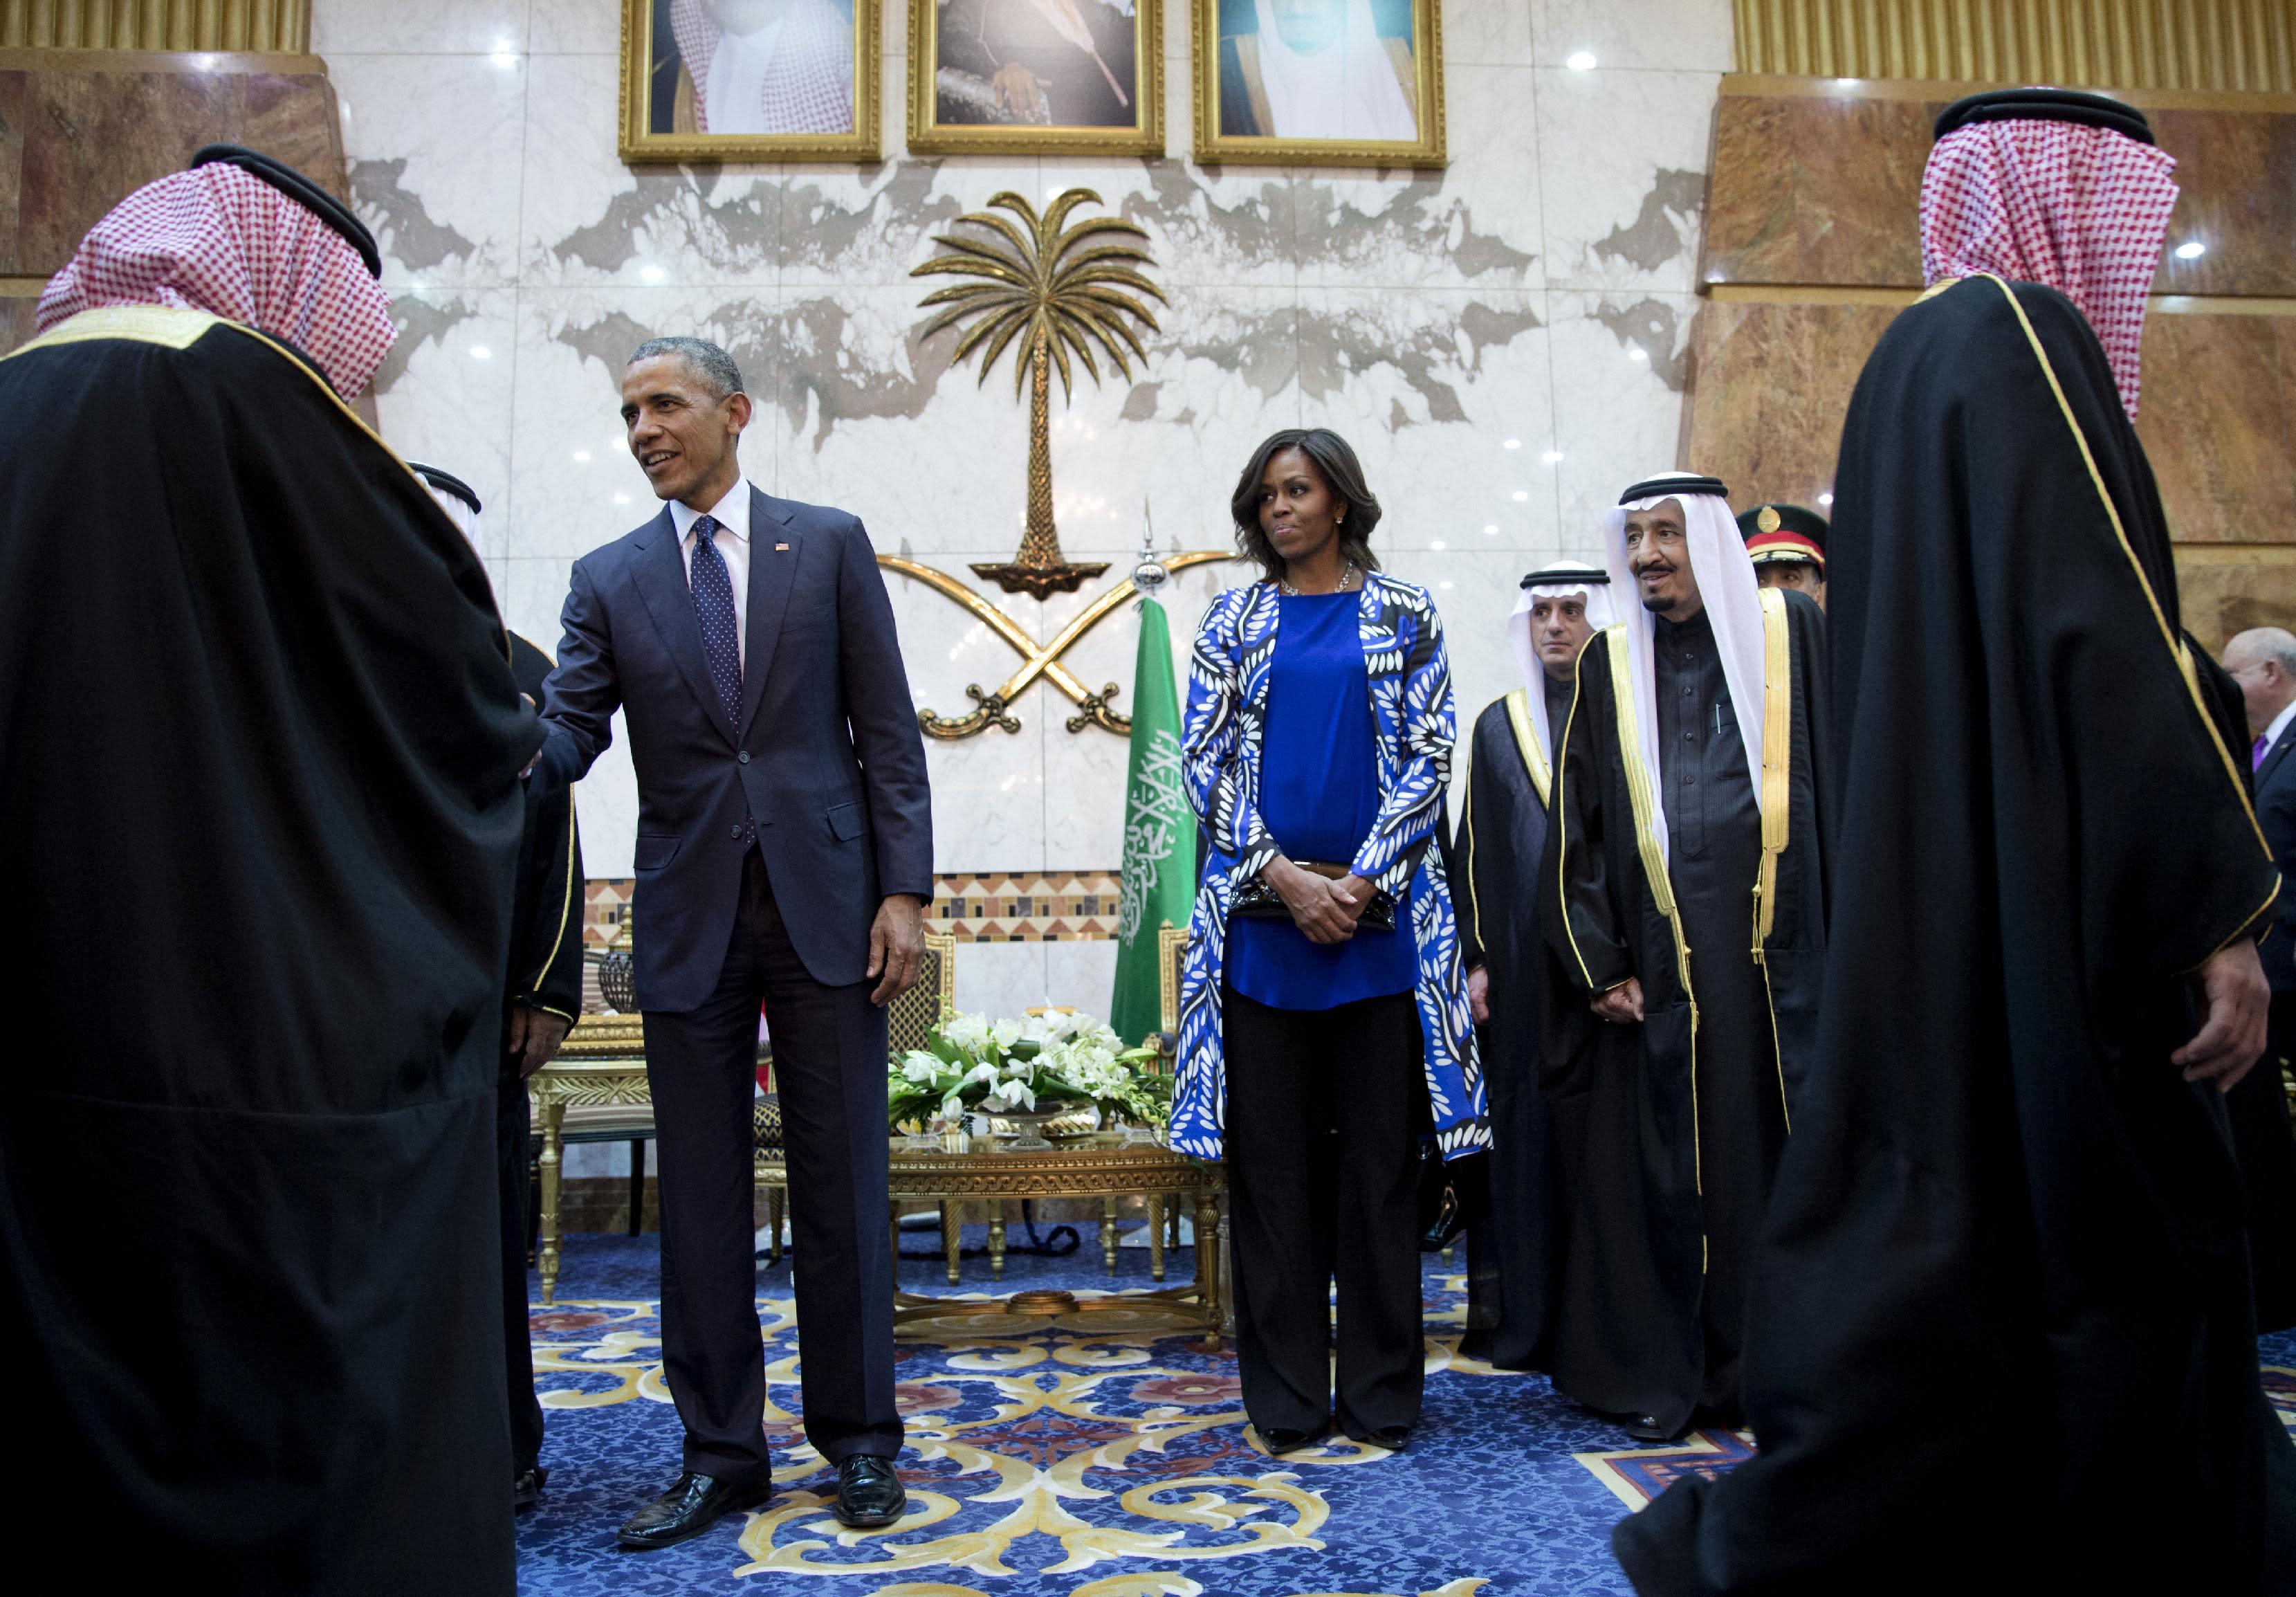 Michelle Obama navigates limits on women in Saudi Arabia